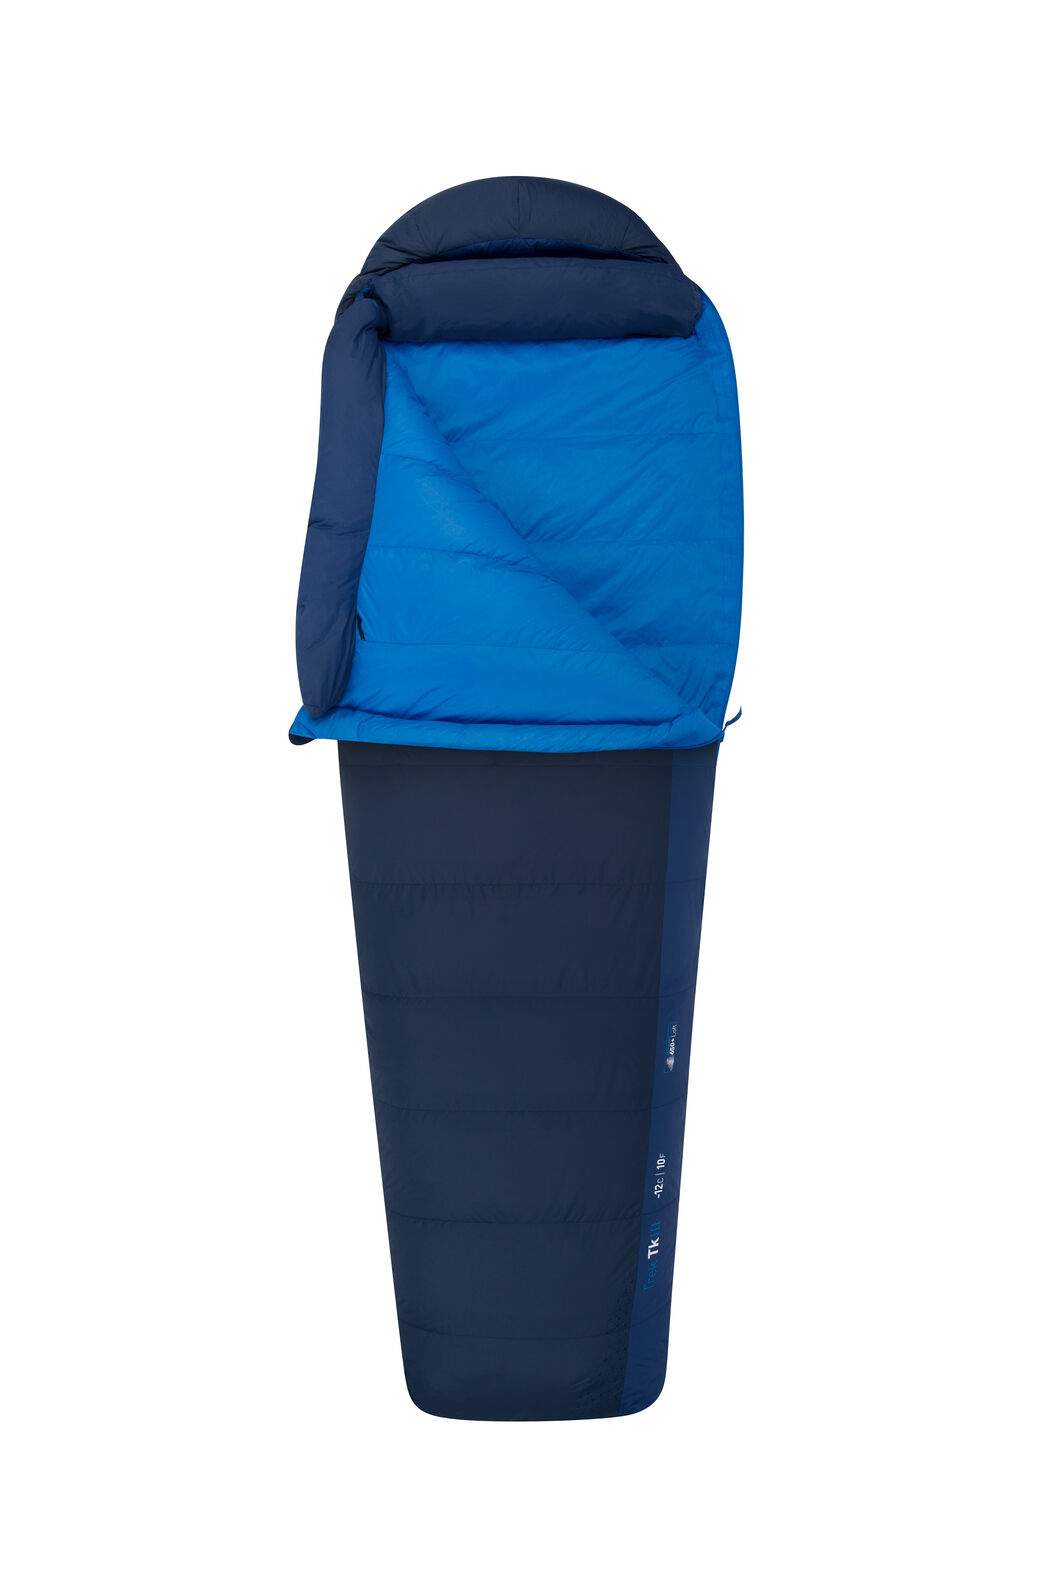 Sea to Summit Trek TKIII Sleeping Bag - Long, Blue, hi-res